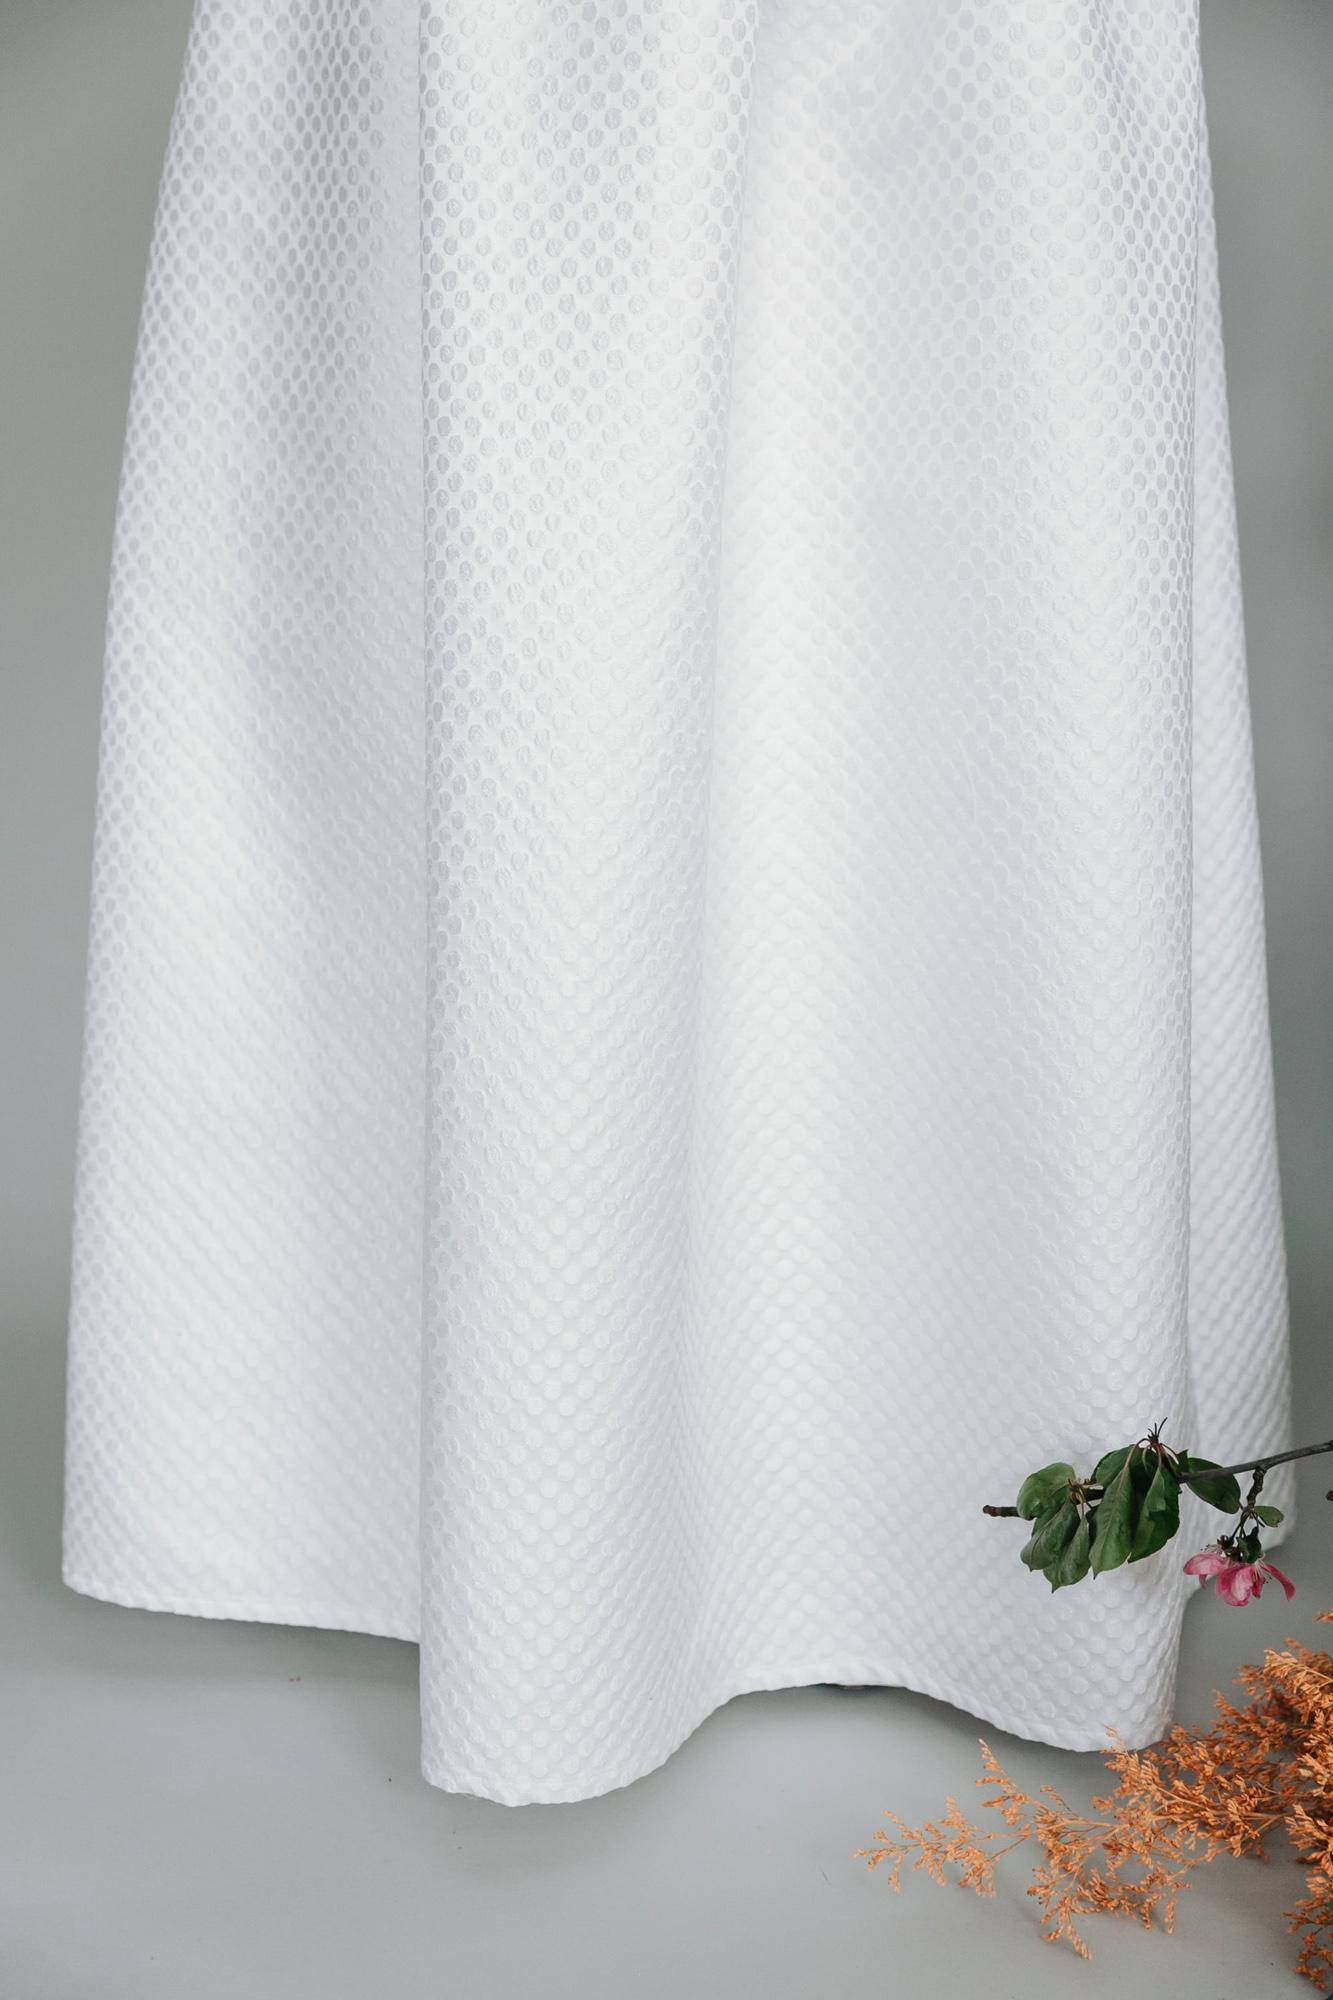 Kate-Beaumont-Sheffield-Zinnia-Modern-Wedding-Gown-Polka-Dot-Pleated-Skirt-12.jpg